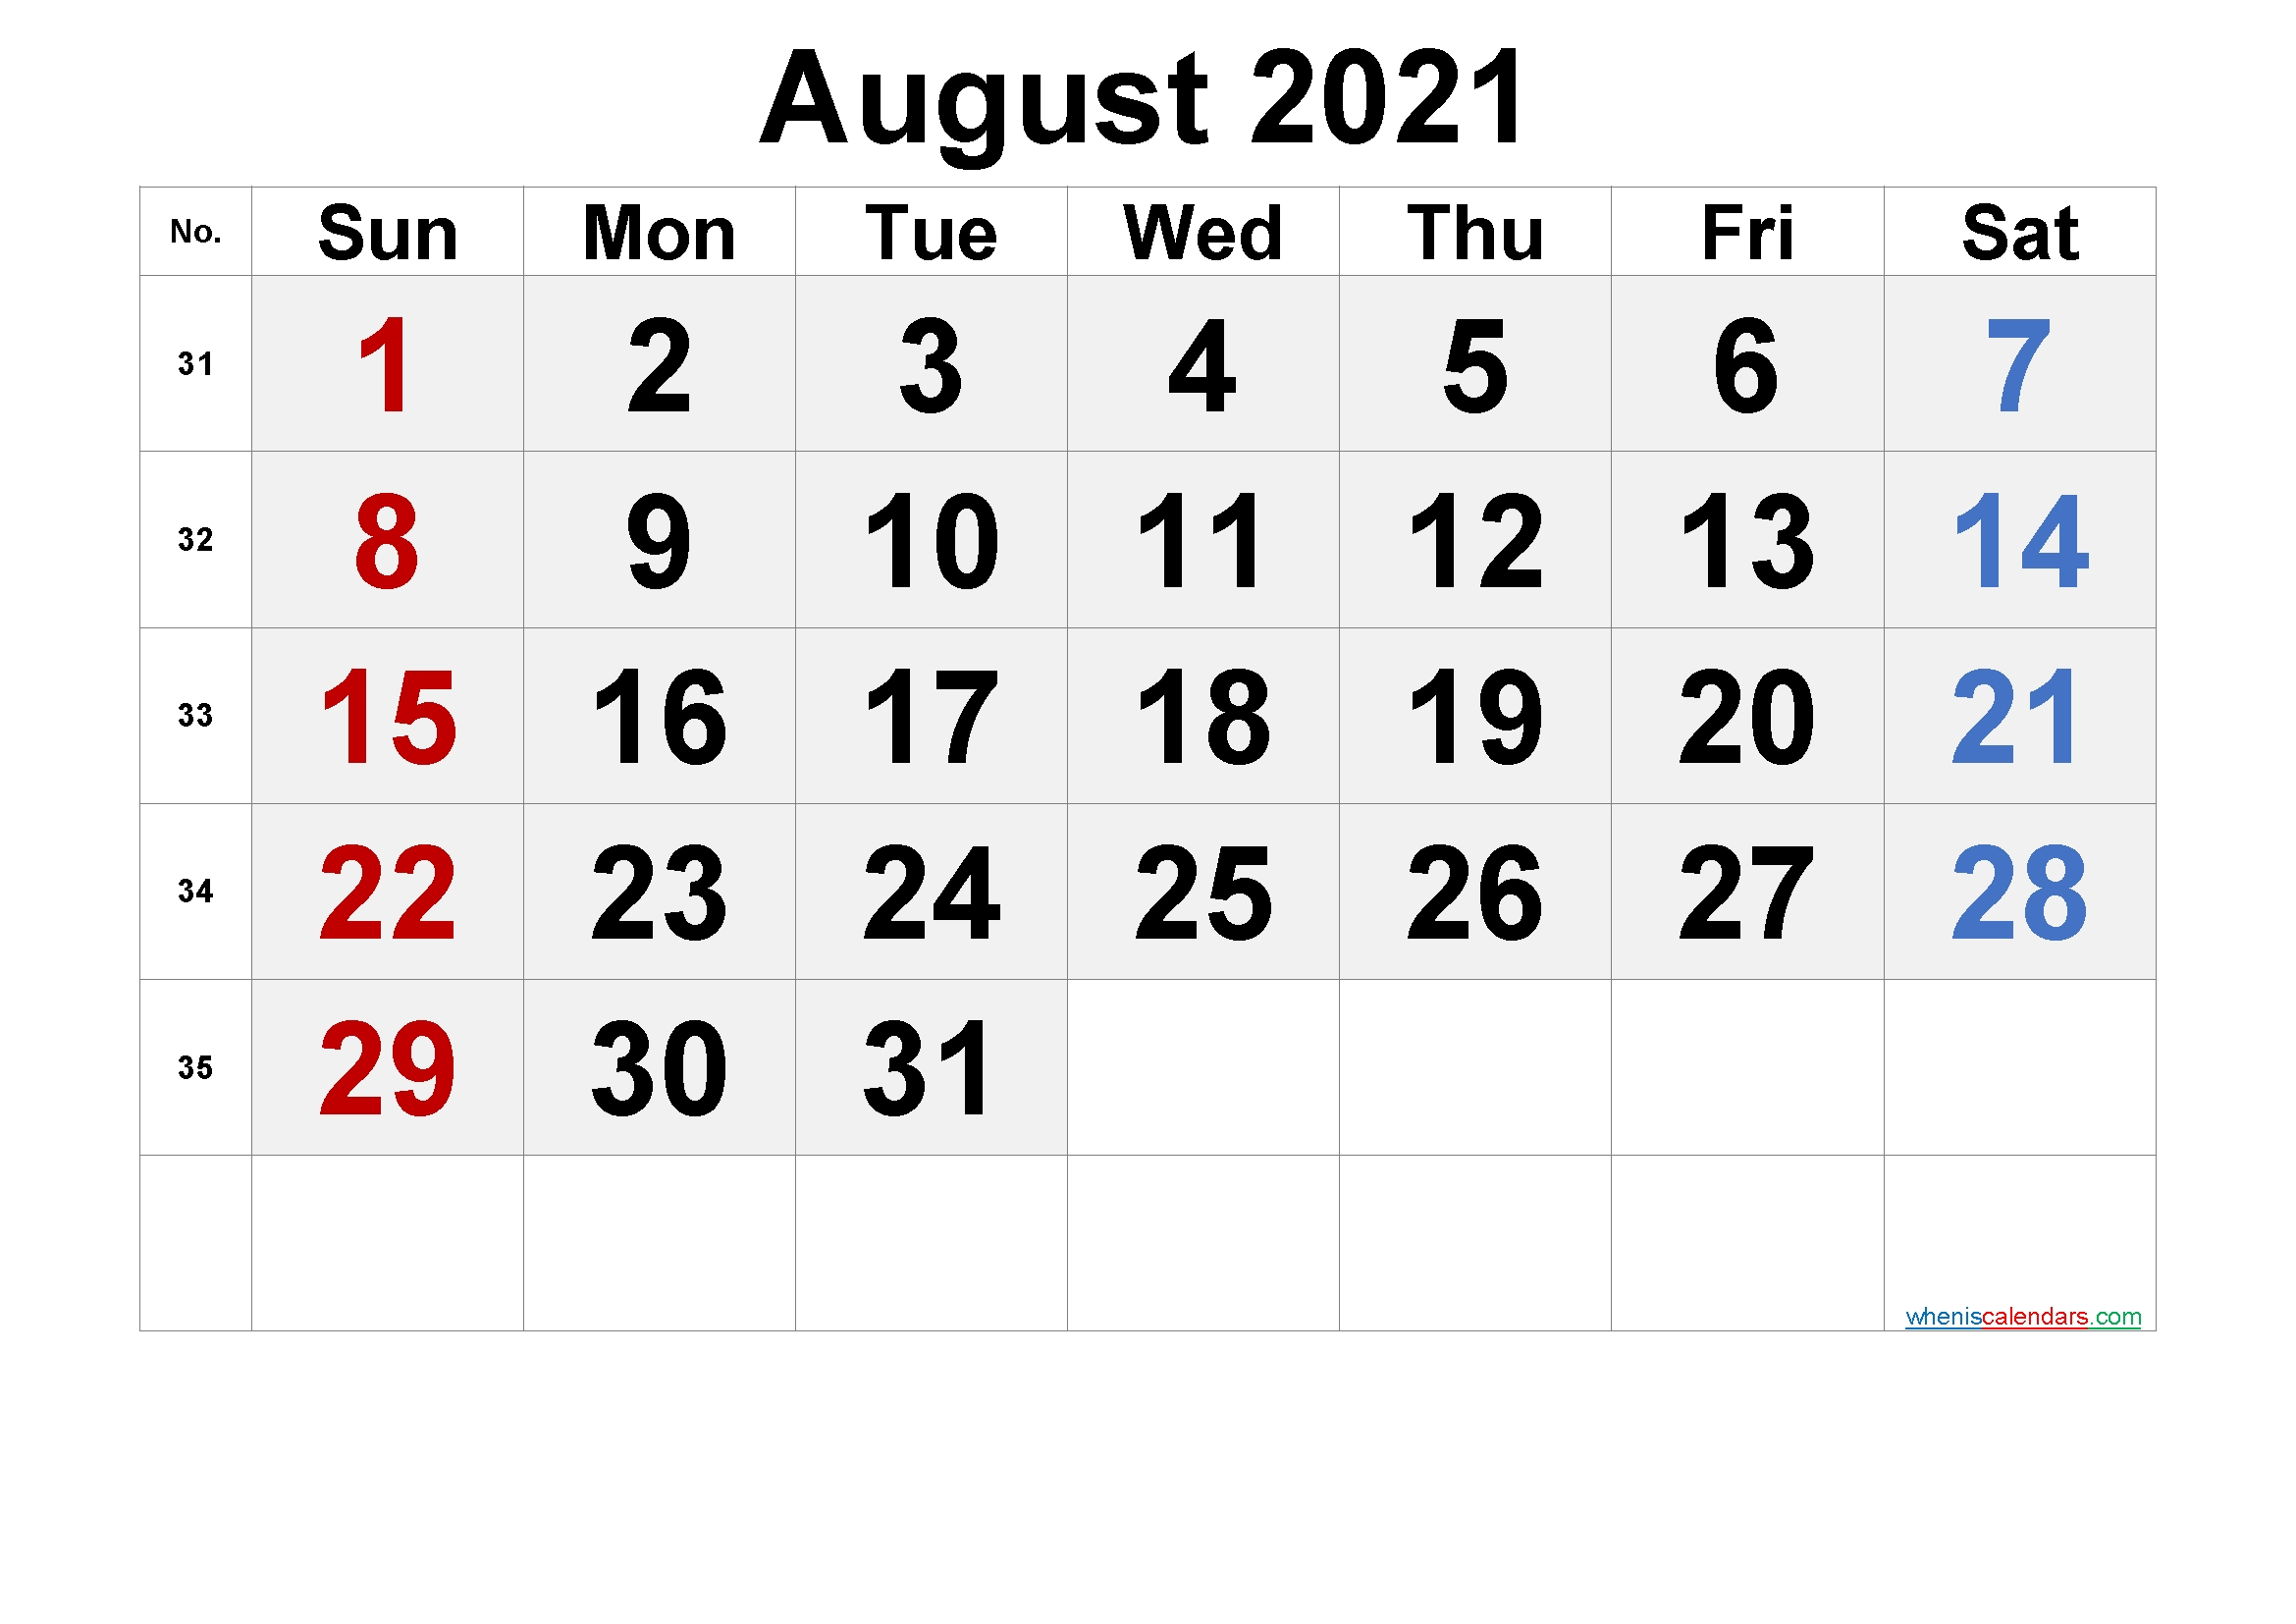 Printable June 2021 Calendar With Holidays - 6 Templates | Free Printable 2020 Monthly Calendar August 2021 Calendar With Holidays Usa